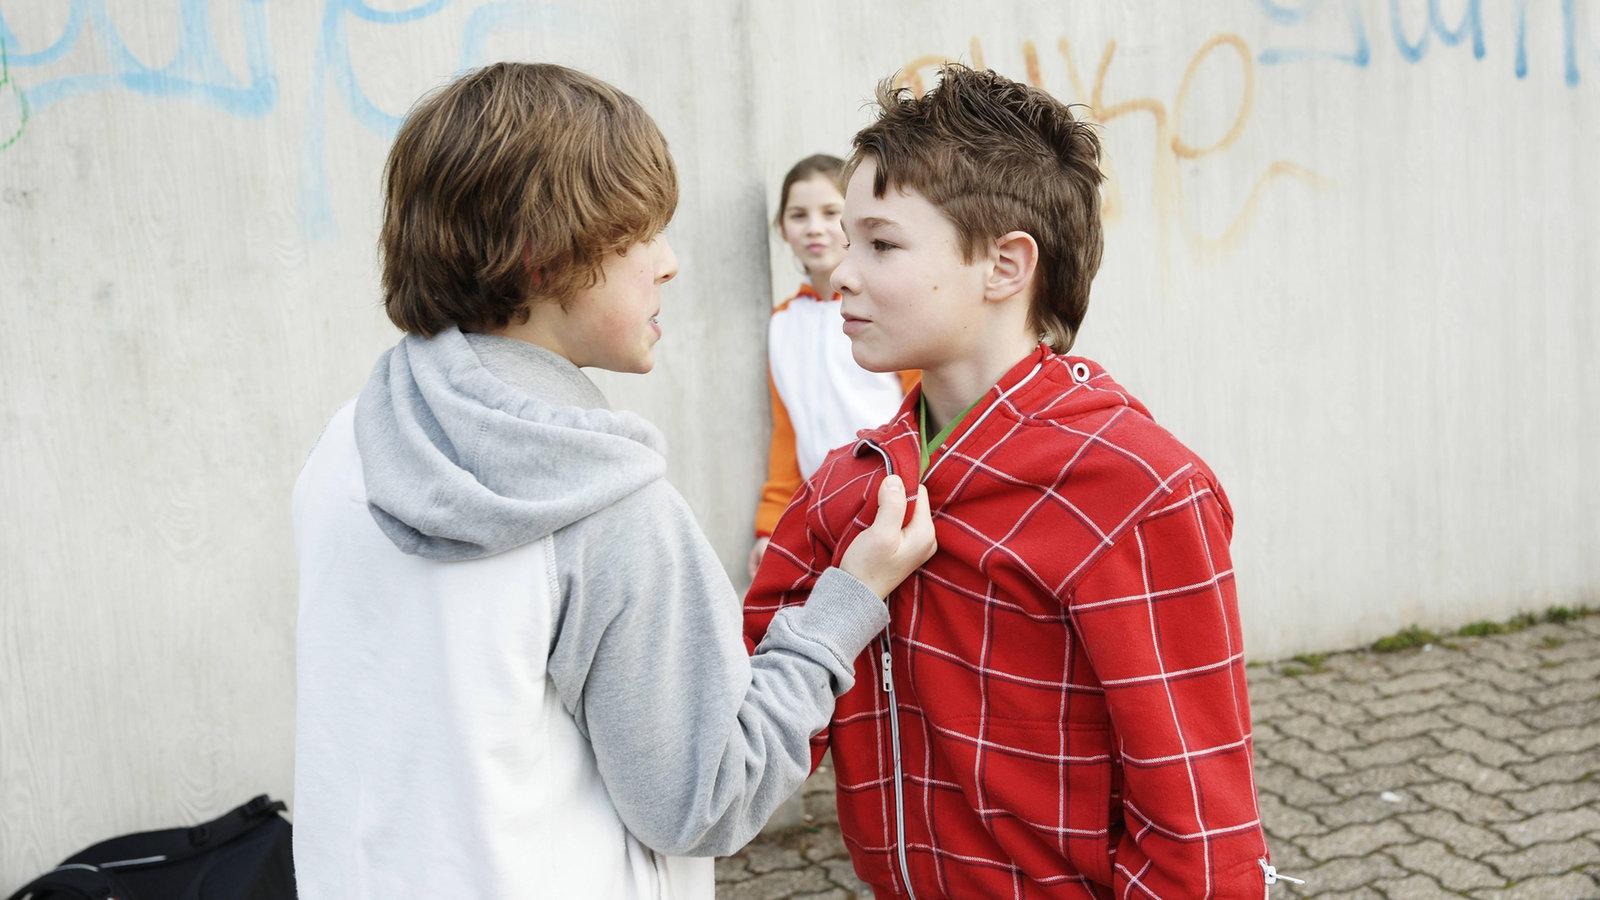 aggression pubertät jungen